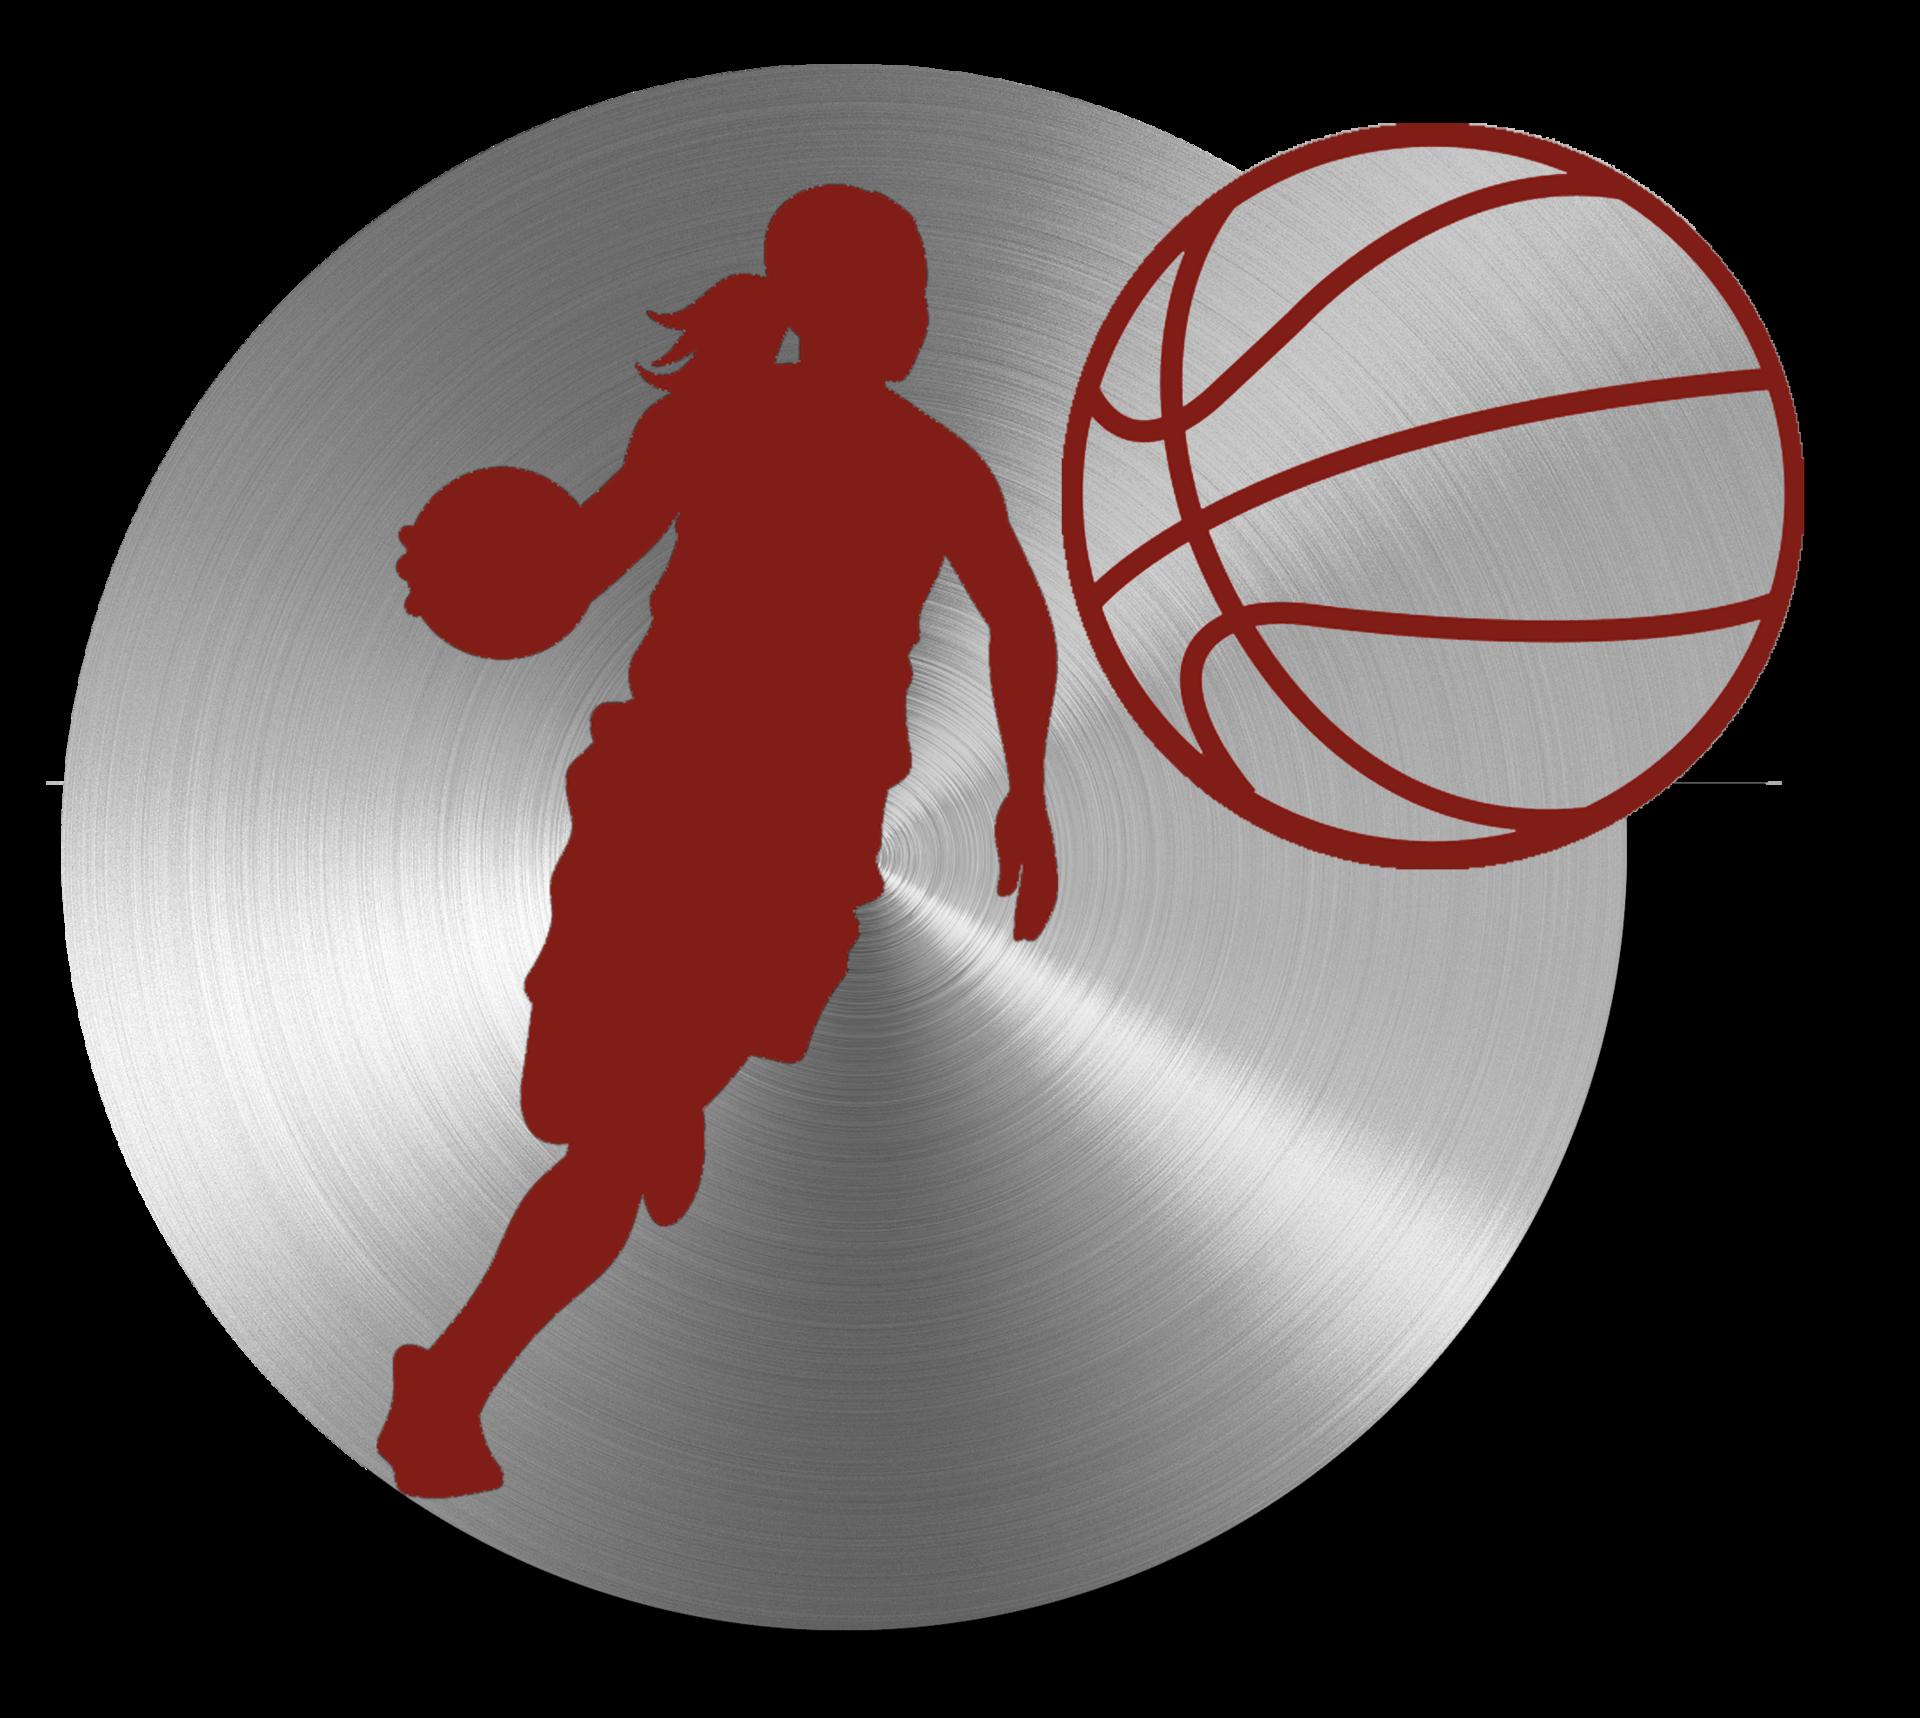 basketball girl icon